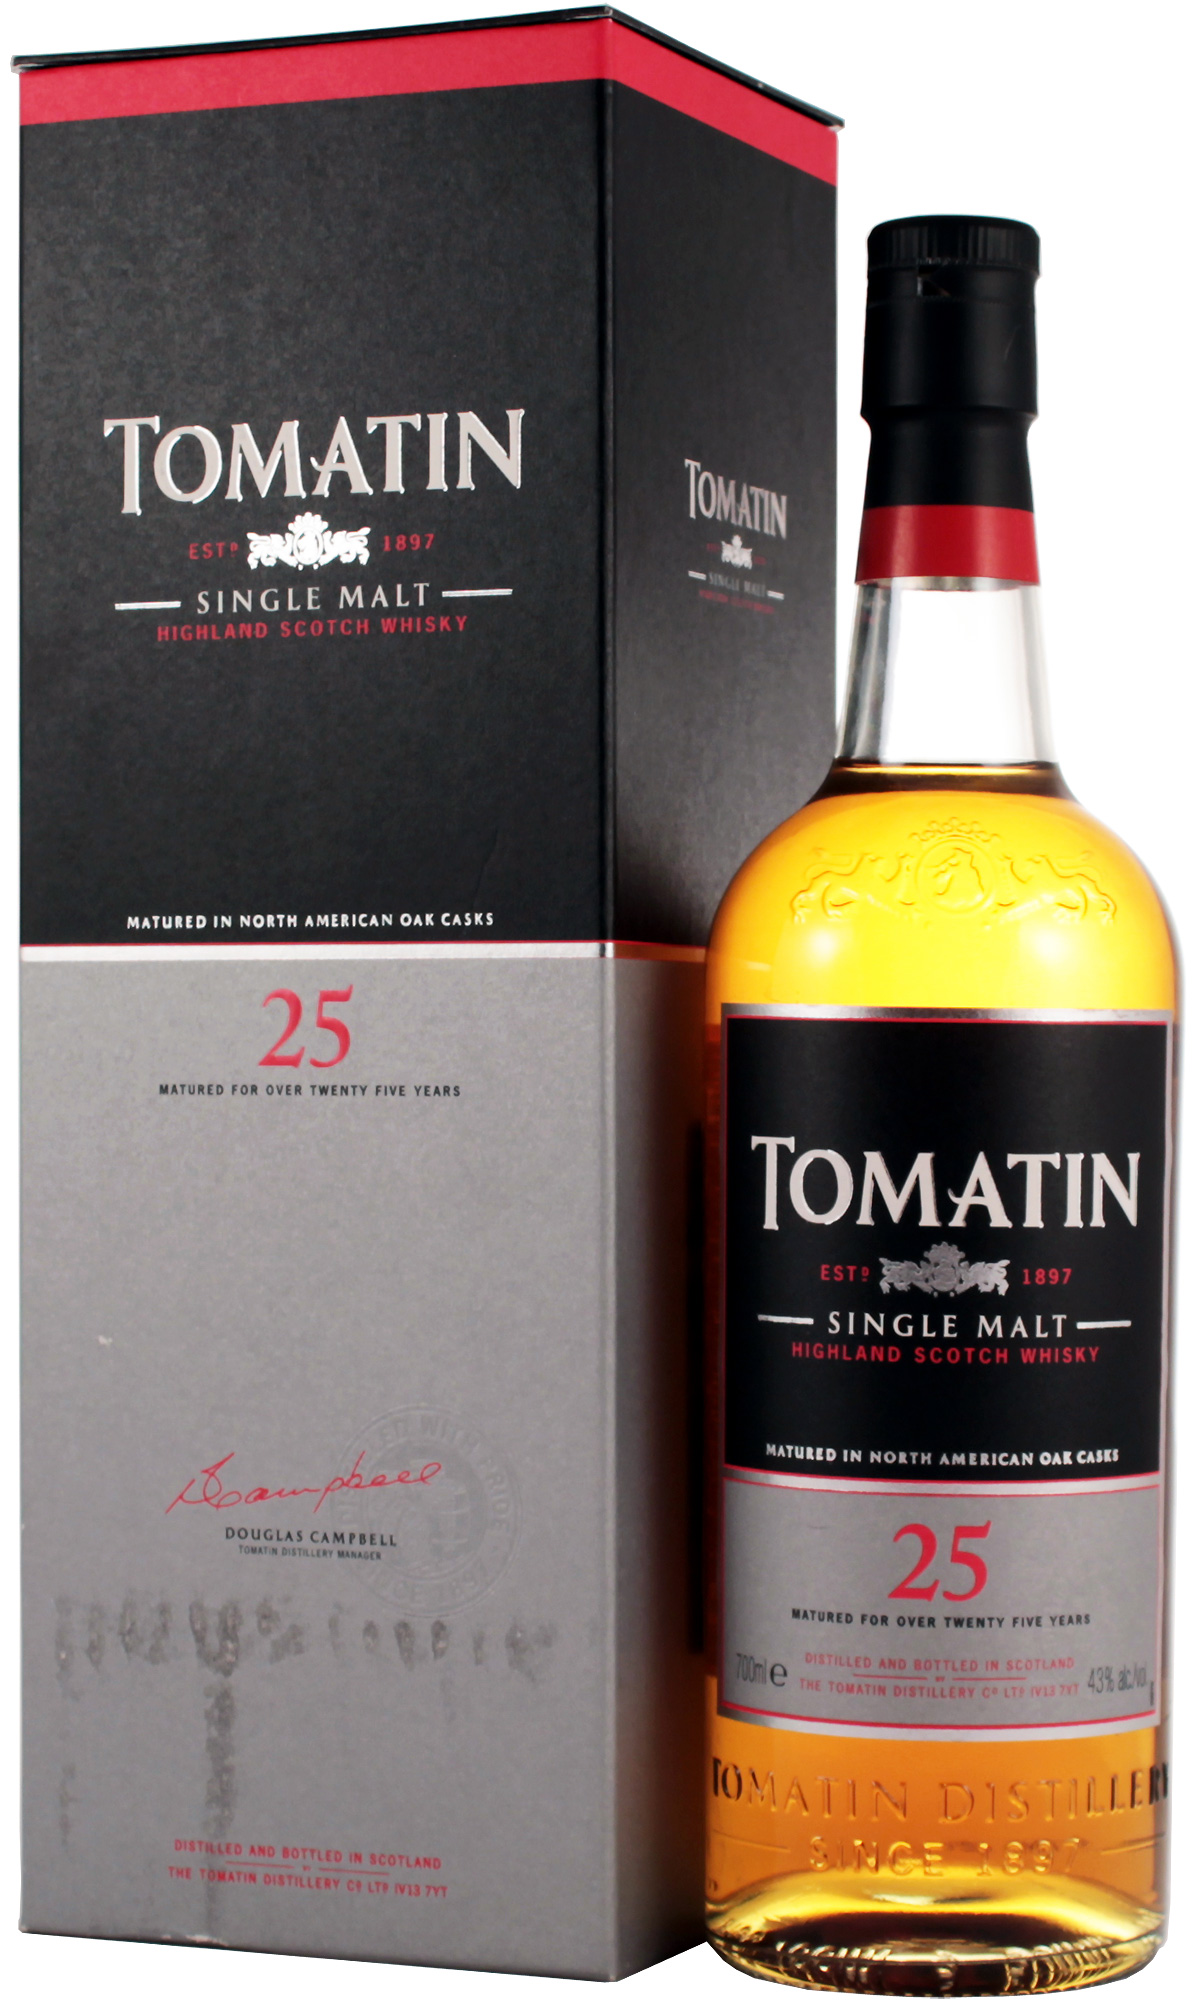 giá rượu Tomatin 25 năm